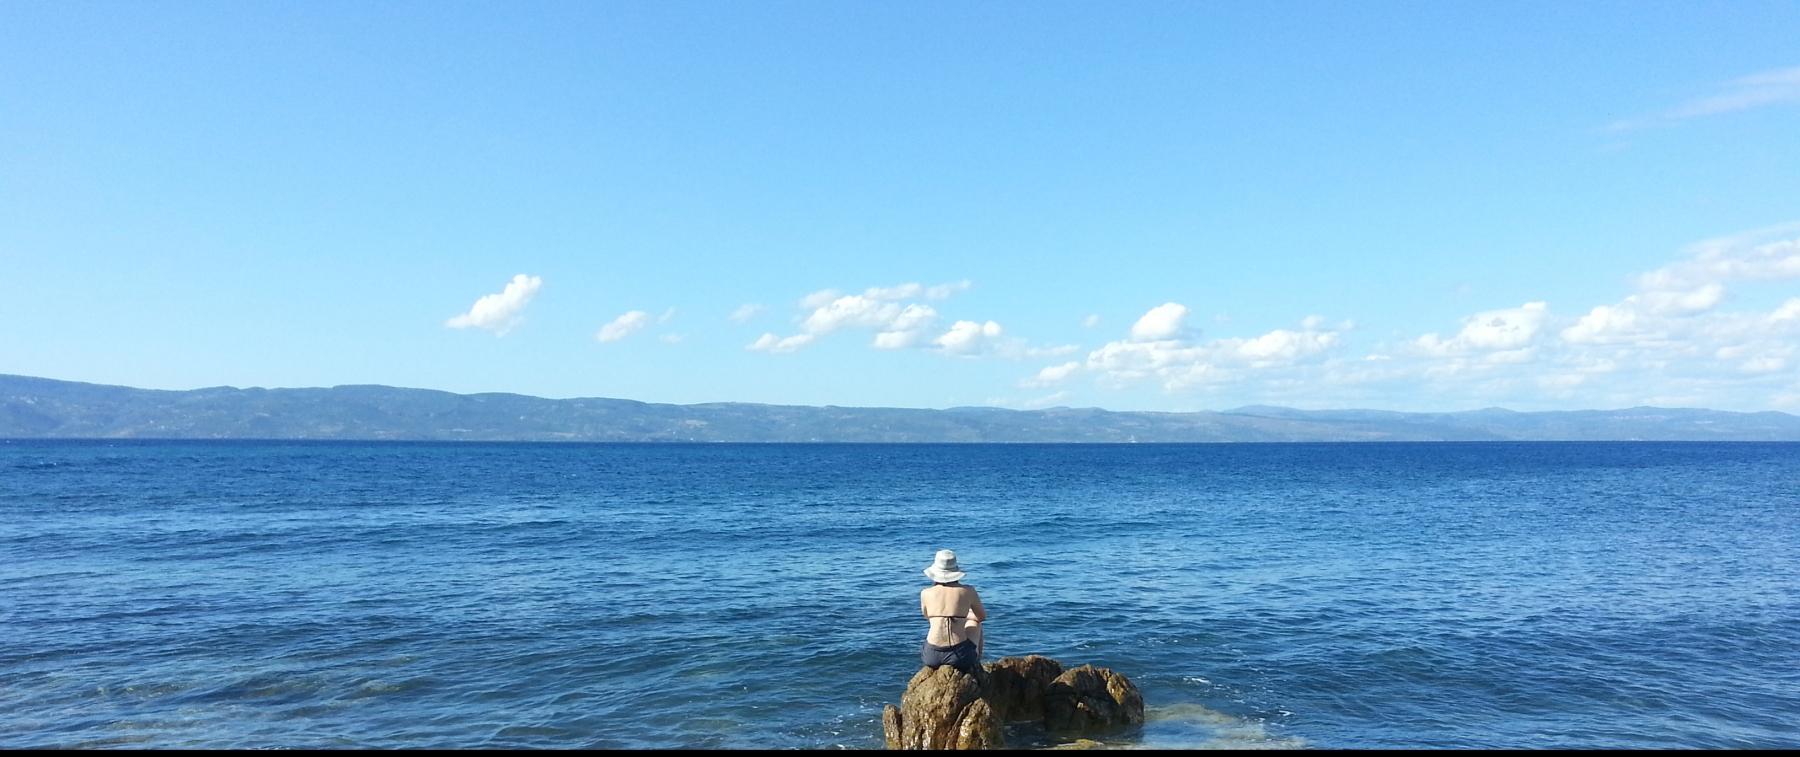 H-in-the-Aegean-Sea-gazing-at-Turkey